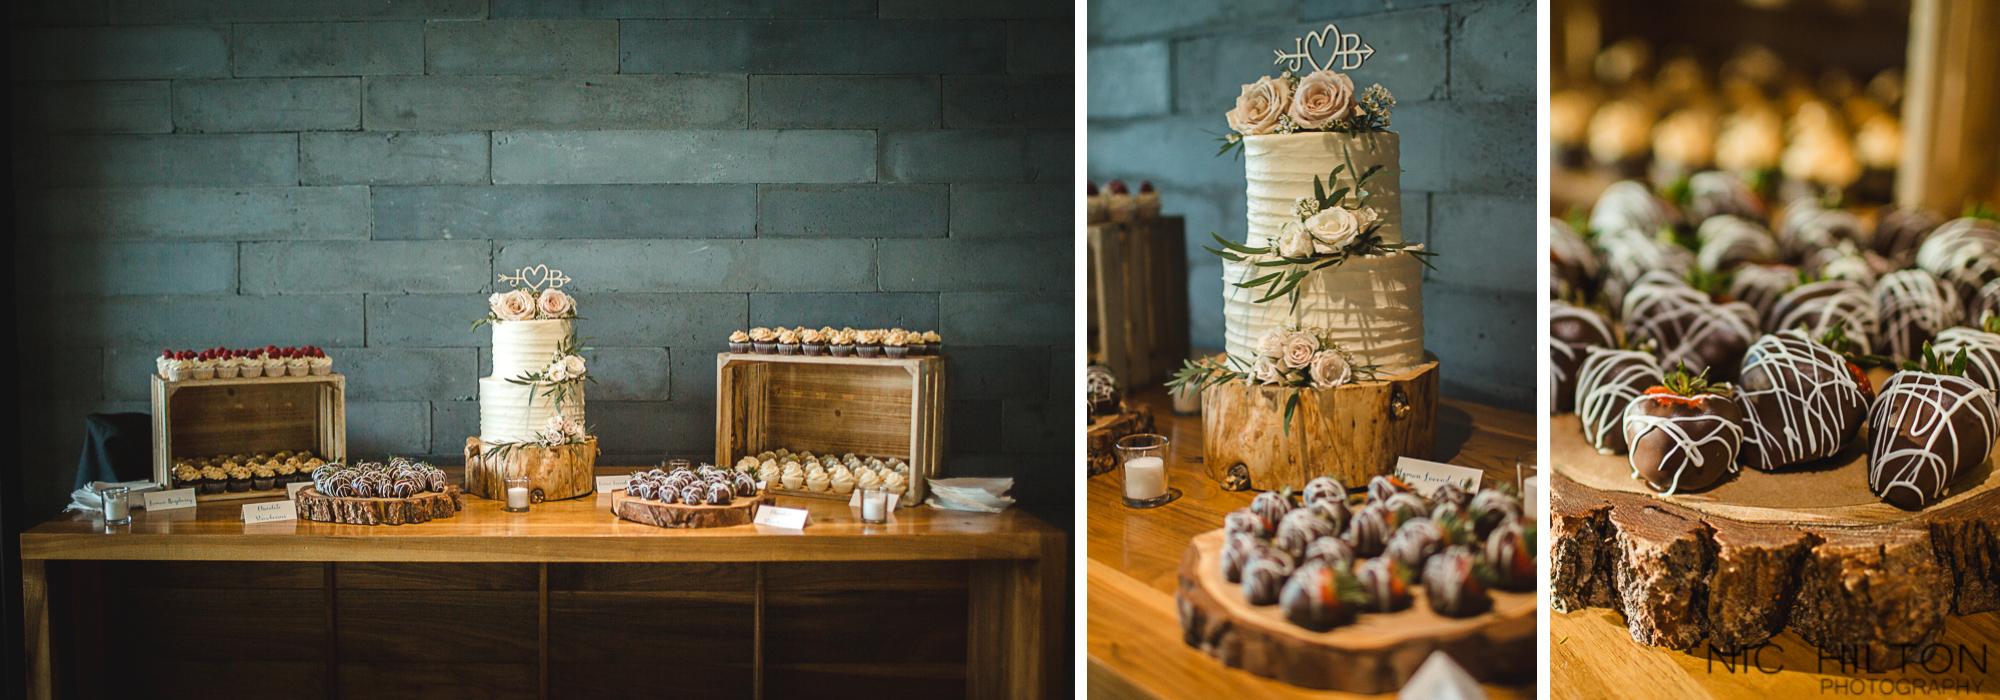 Mammoth-Mountain-Wedding-Reception-Details.jpg